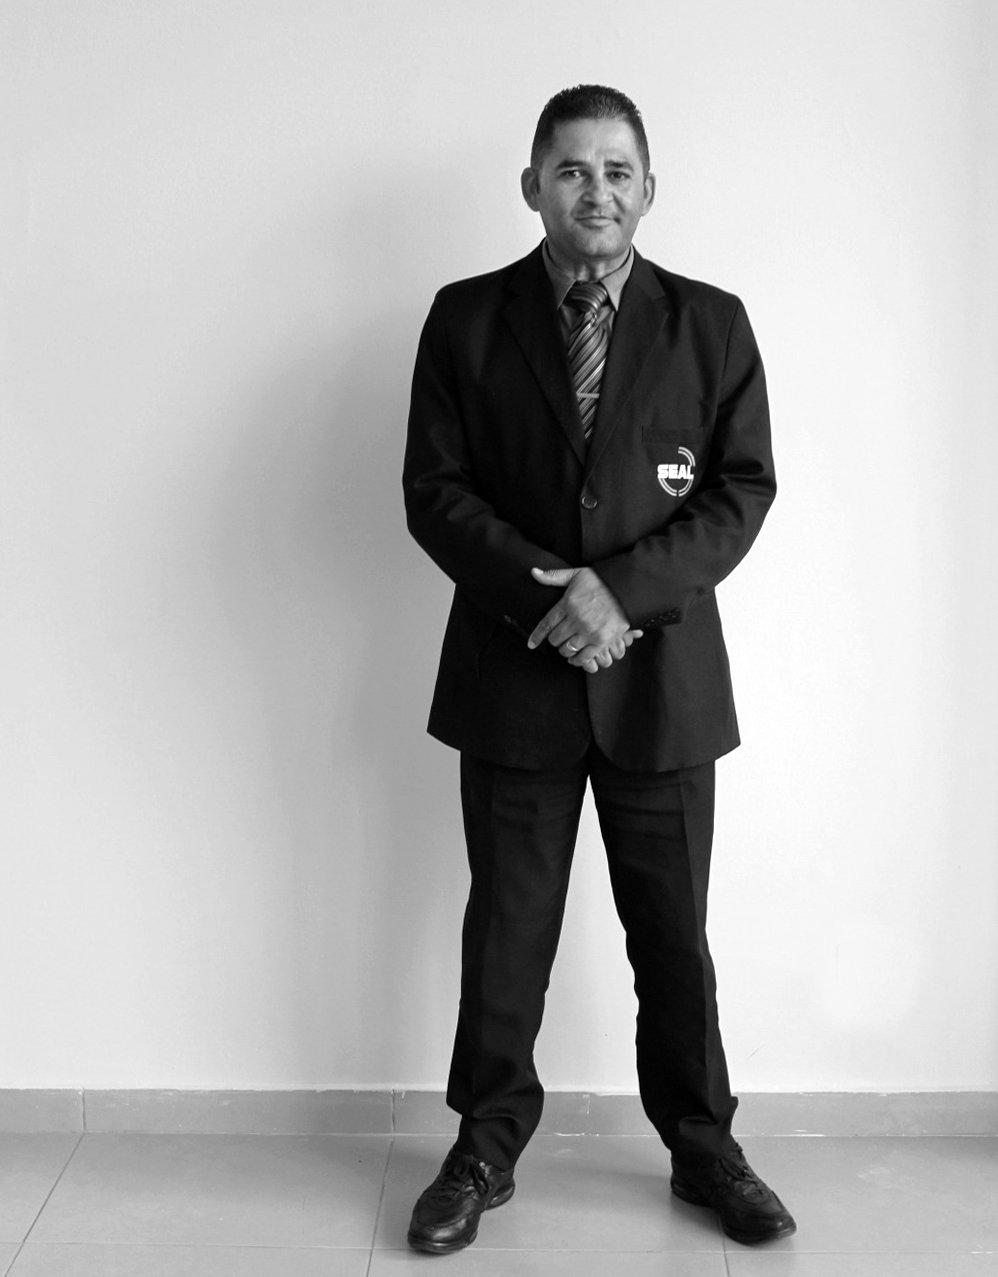 Luciano Rocha